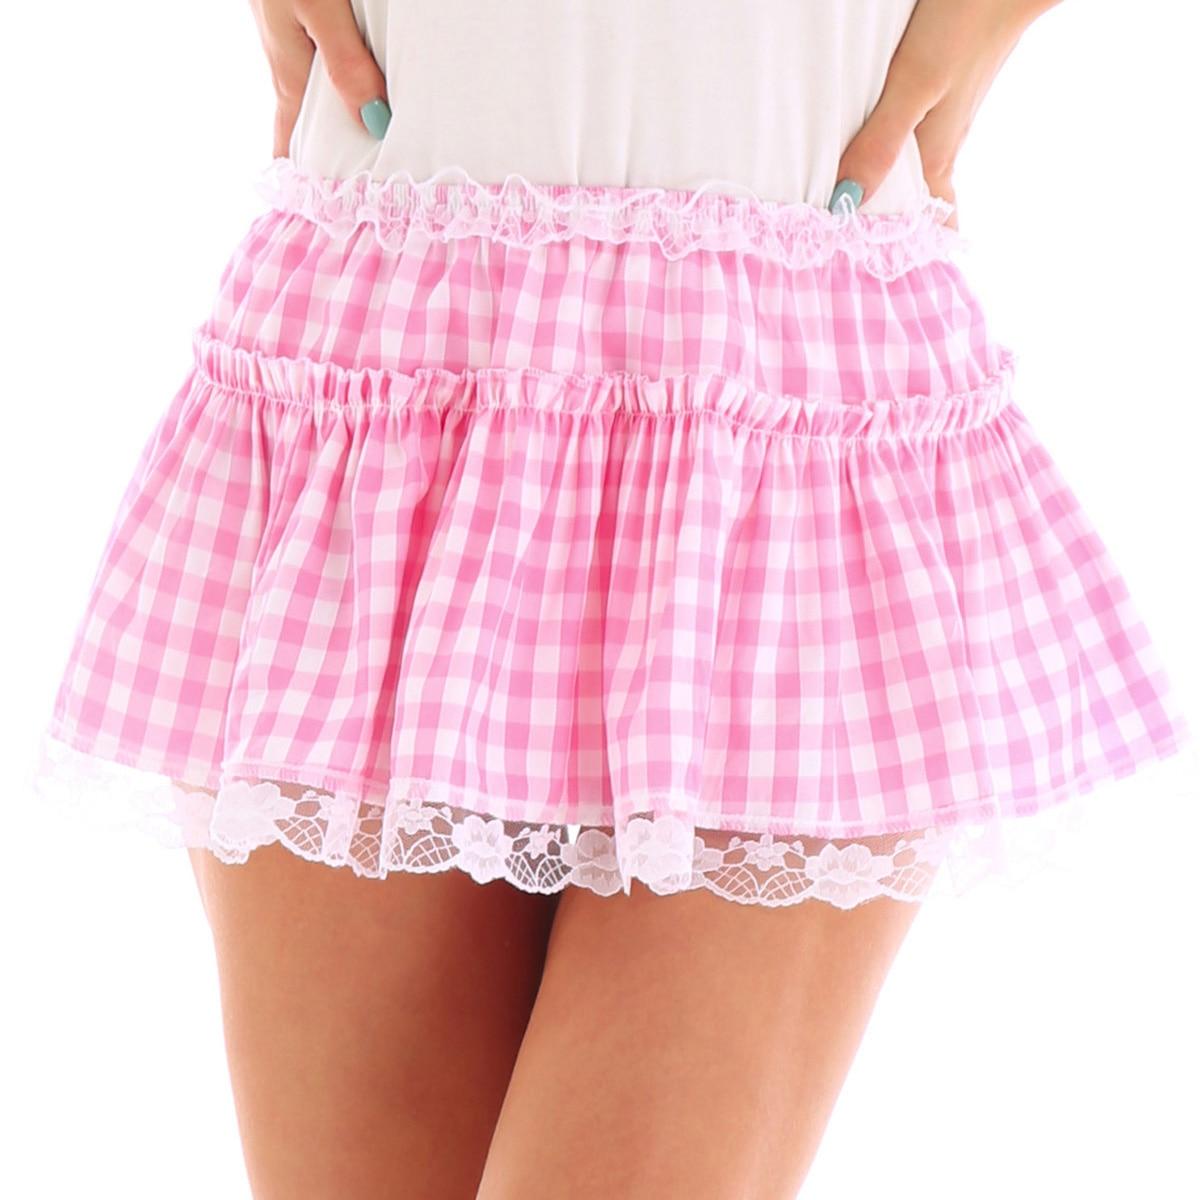 Unisex Men Women A line Mini Skirt  Men Sexy Sissy Skirt Elastic Waistband Short Skirt with Lace Hem Pleated Gingham Roleplay-in Skirts from Women's Clothing